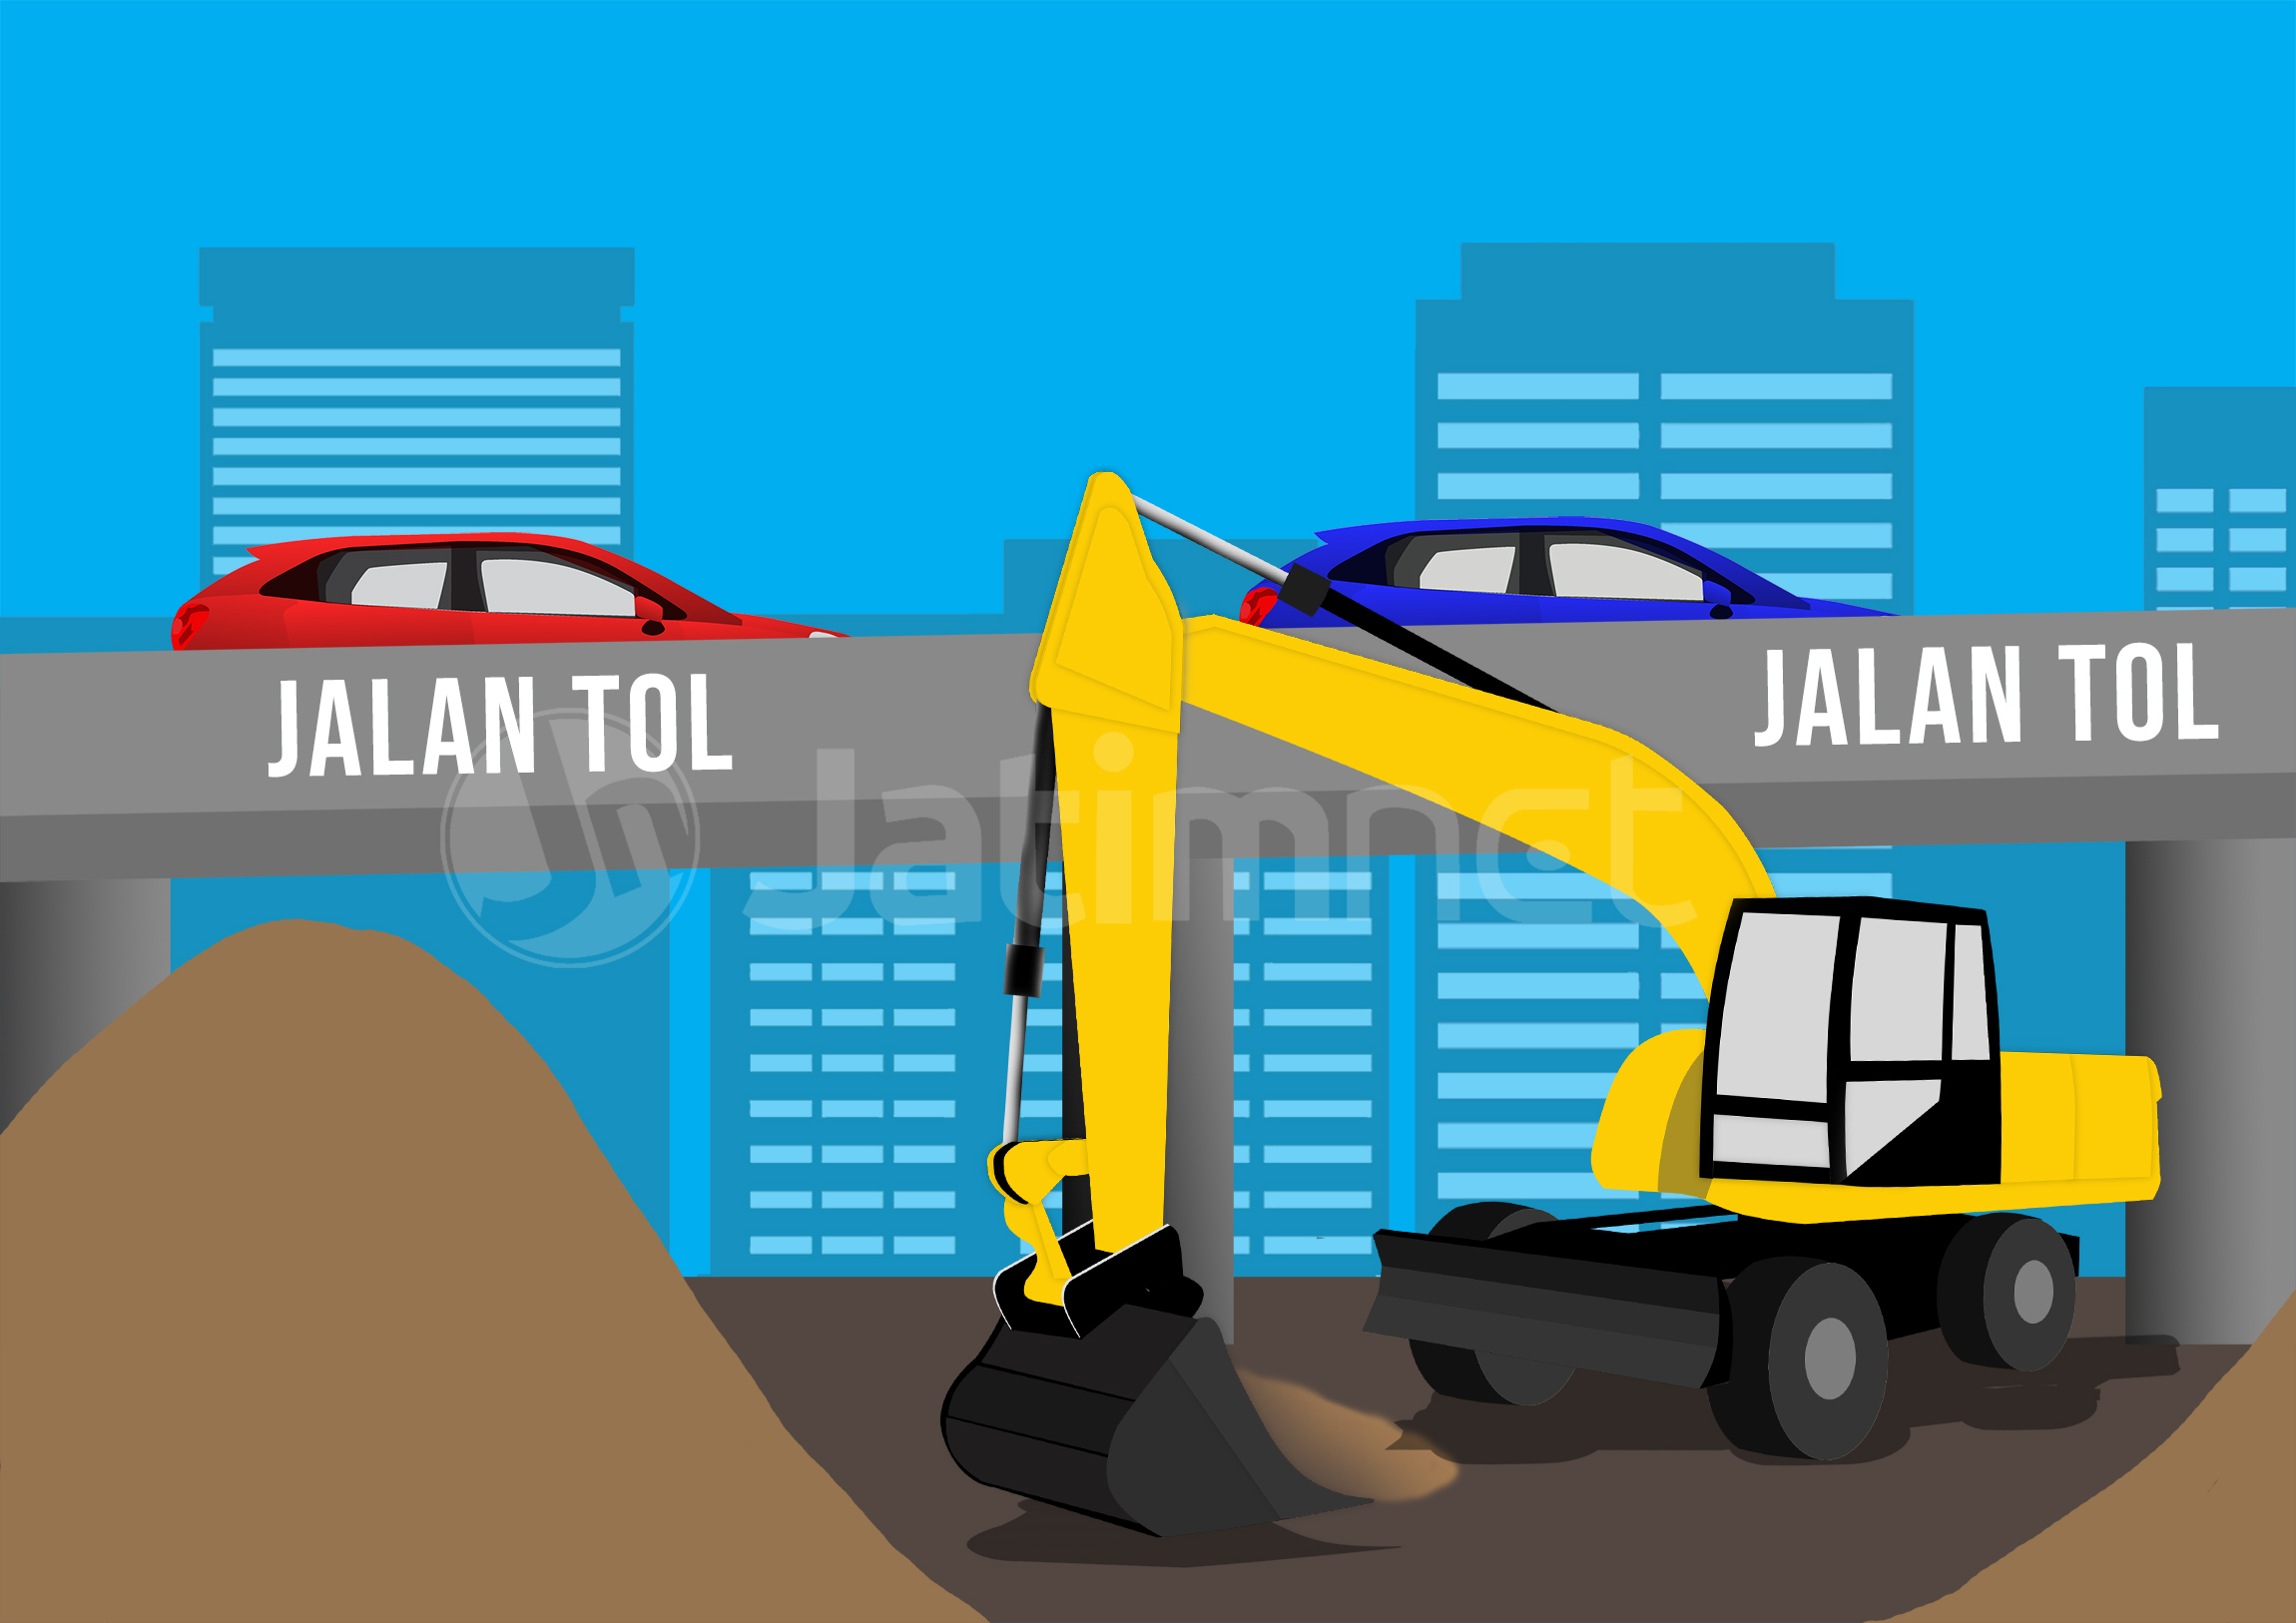 PUPR Dorong Sektor Swasta Terlibat dalam Pembangunan Infrastruktur